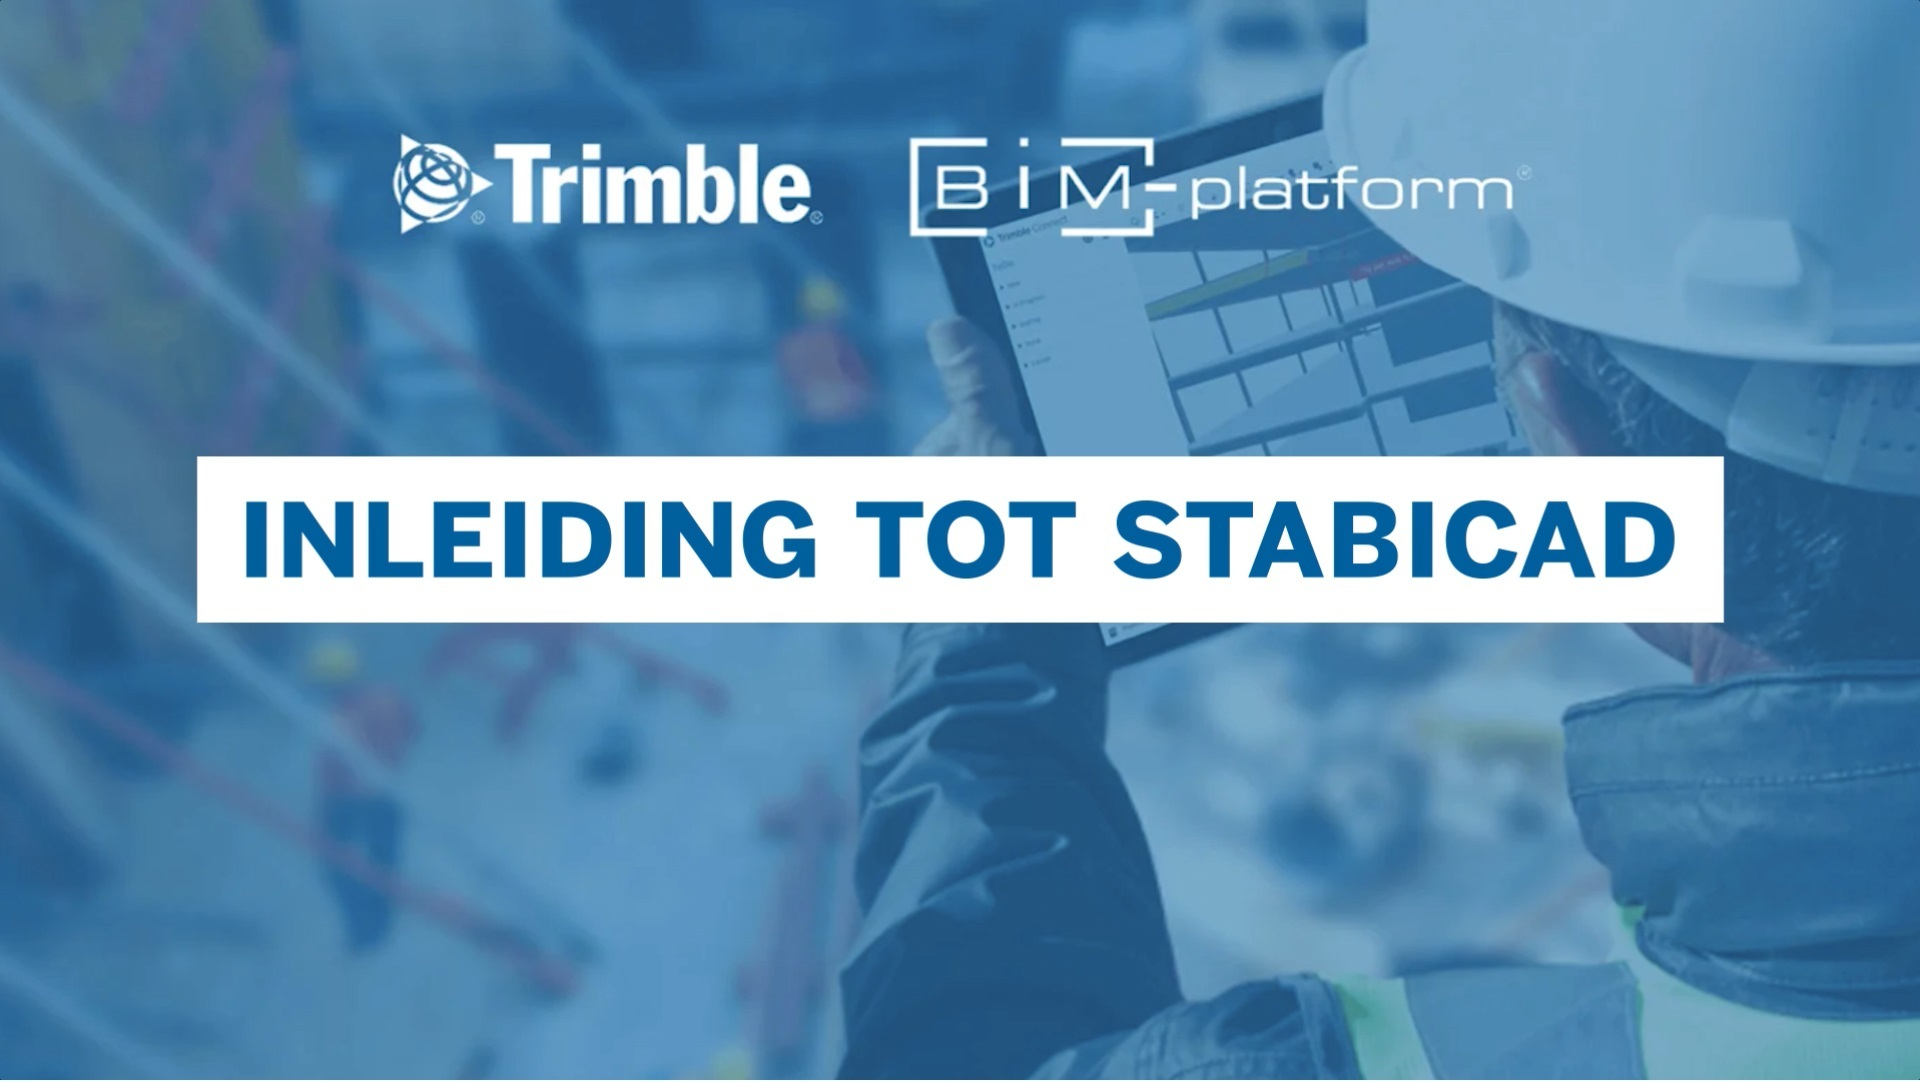 [BIM-Platform & Trimble] Inleiding tot Stabicad